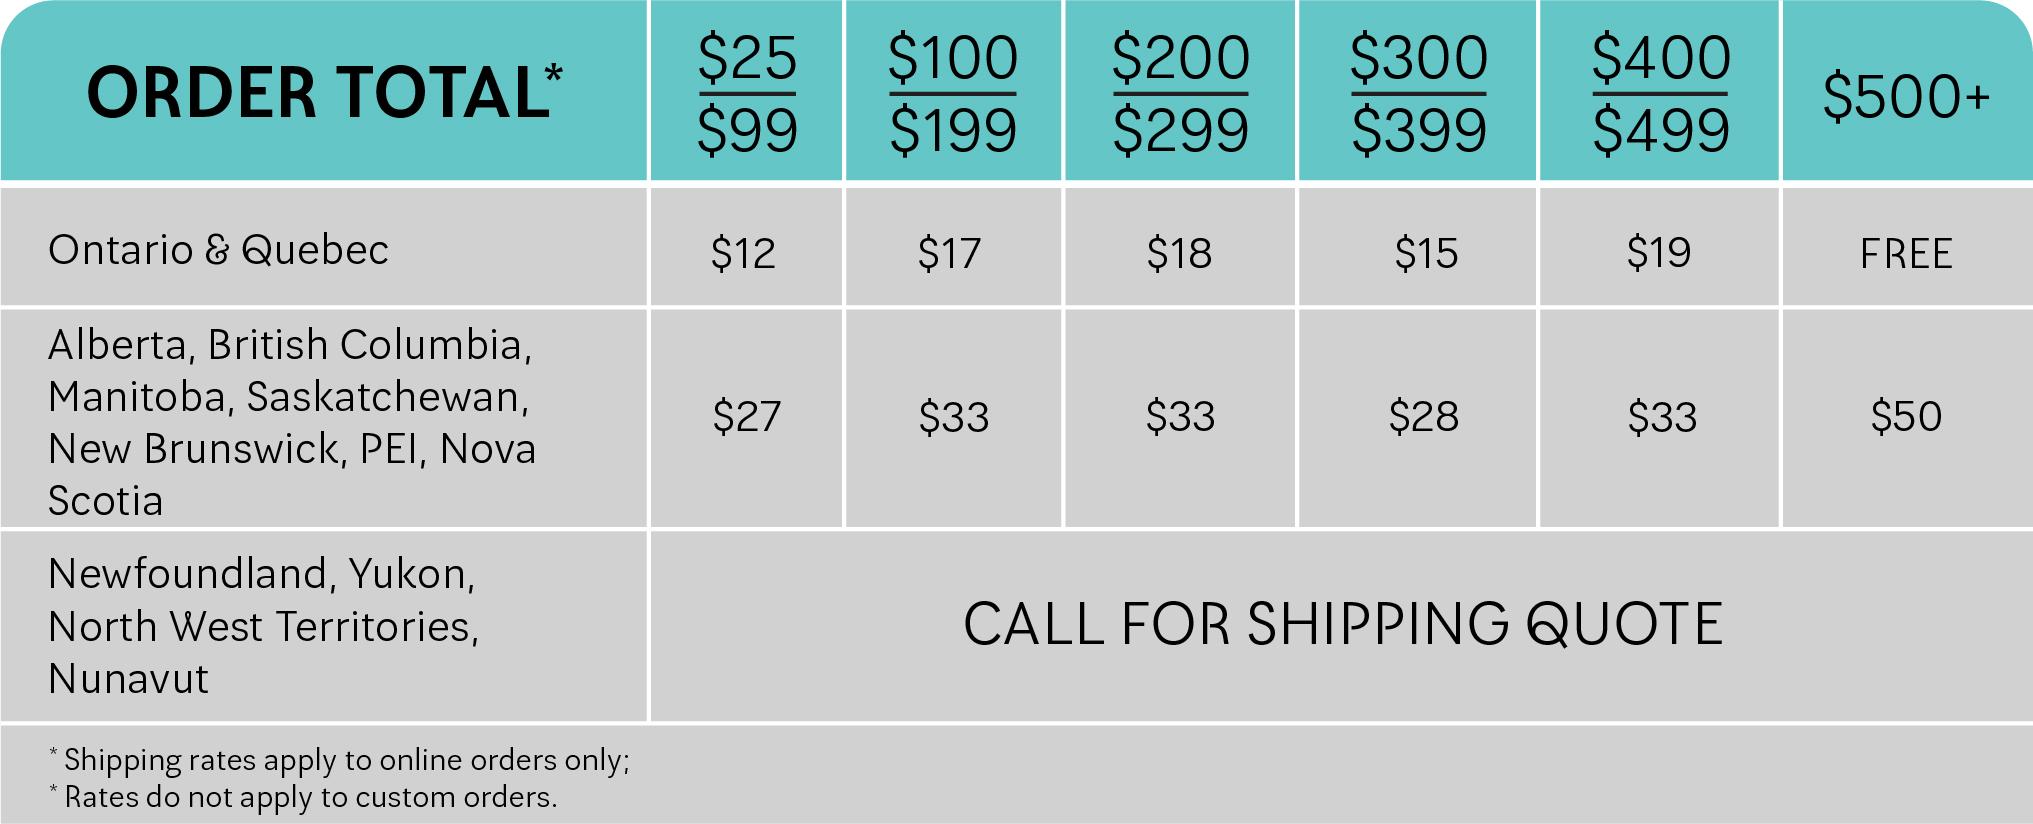 final-shippingrate-table-01-01.jpg